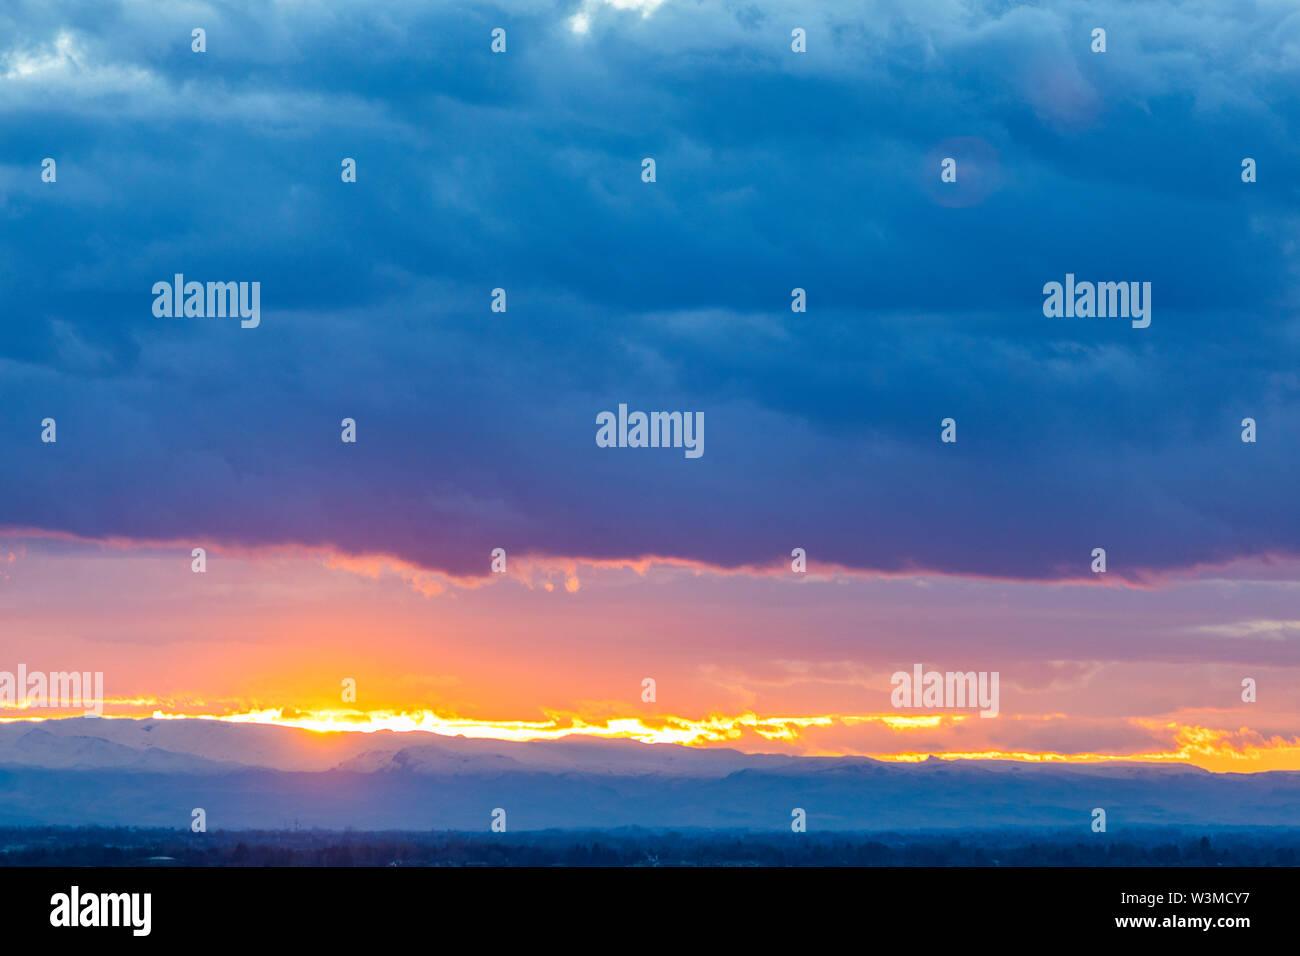 Sunset cloudscape - Stock Image